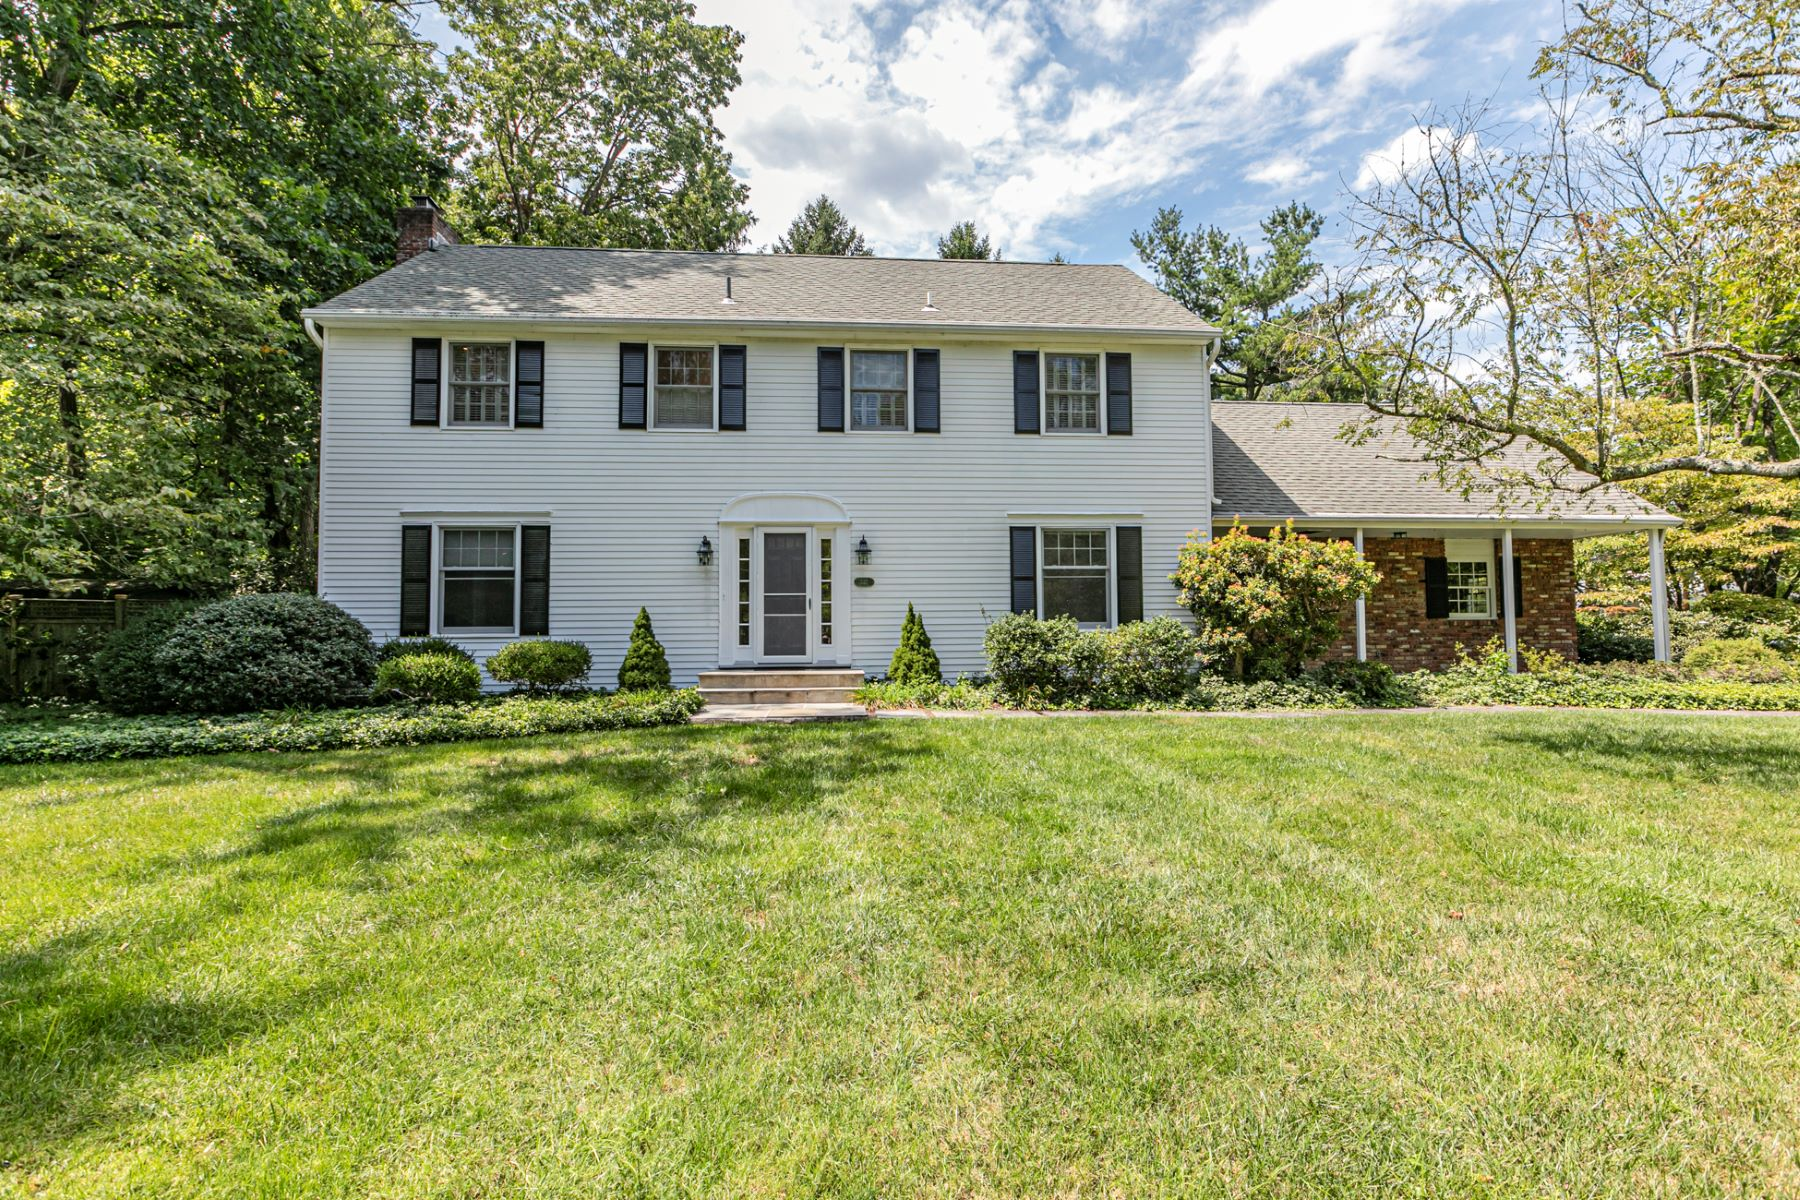 Single Family Homes για την Πώληση στο Beautiful Colonial-Style Home in Coveted Riverside 332 Riverside Drive, Princeton, Νιου Τζερσεϋ 08540 Ηνωμένες Πολιτείες